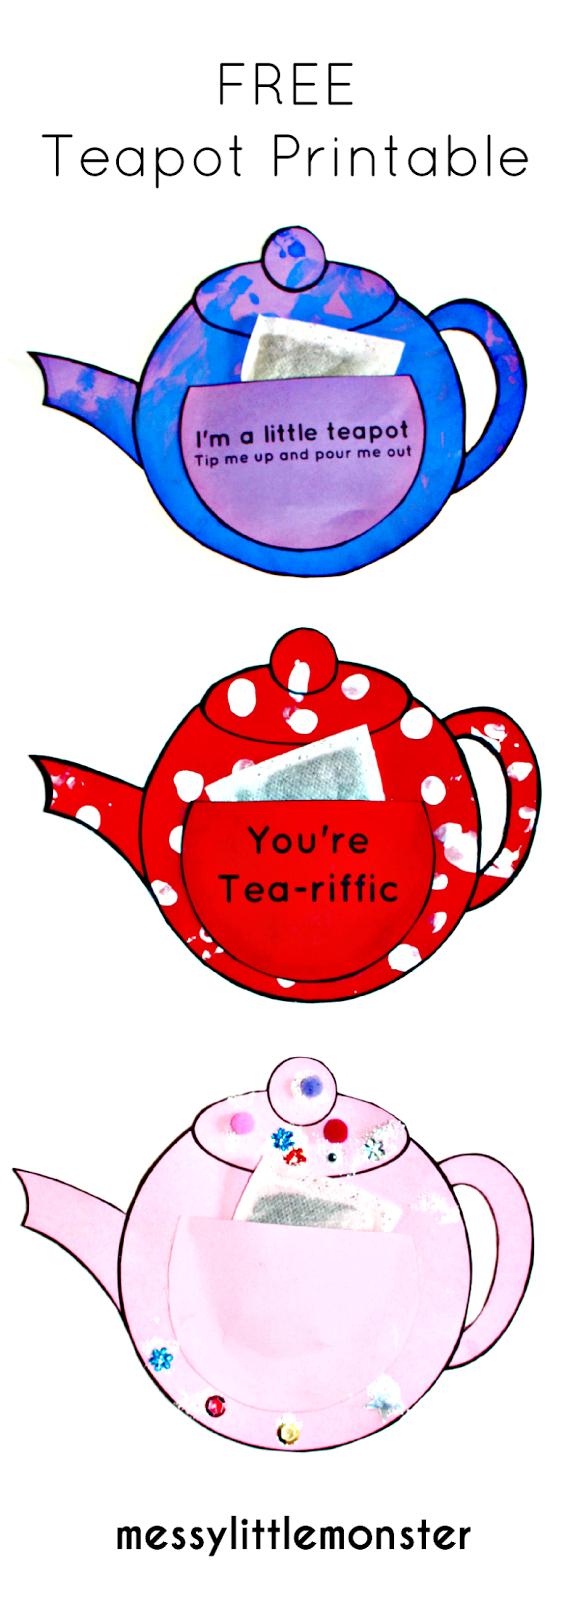 You're Tea-Riffic Teapot Craft - Free Printable Teapot Template - Free Teapot Printable